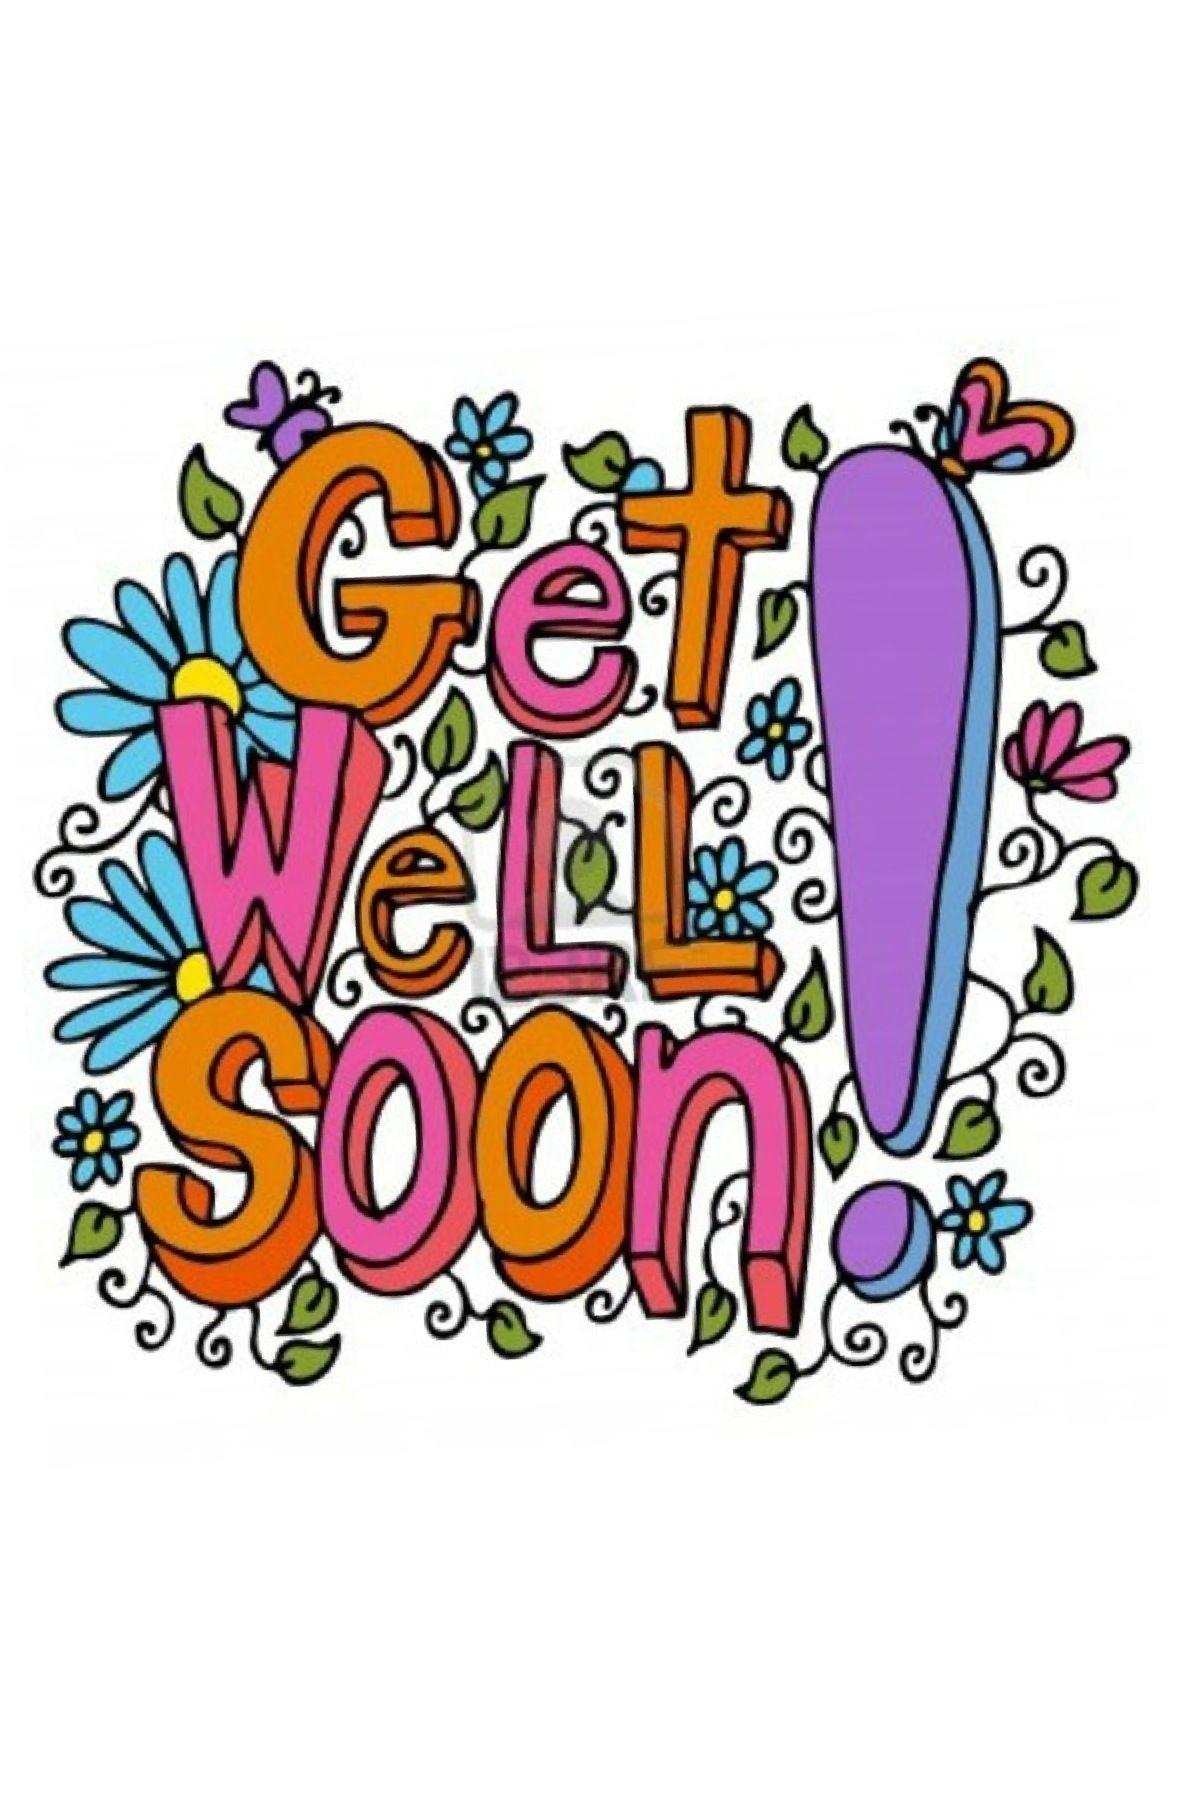 Medium Of Get Well Soon Message